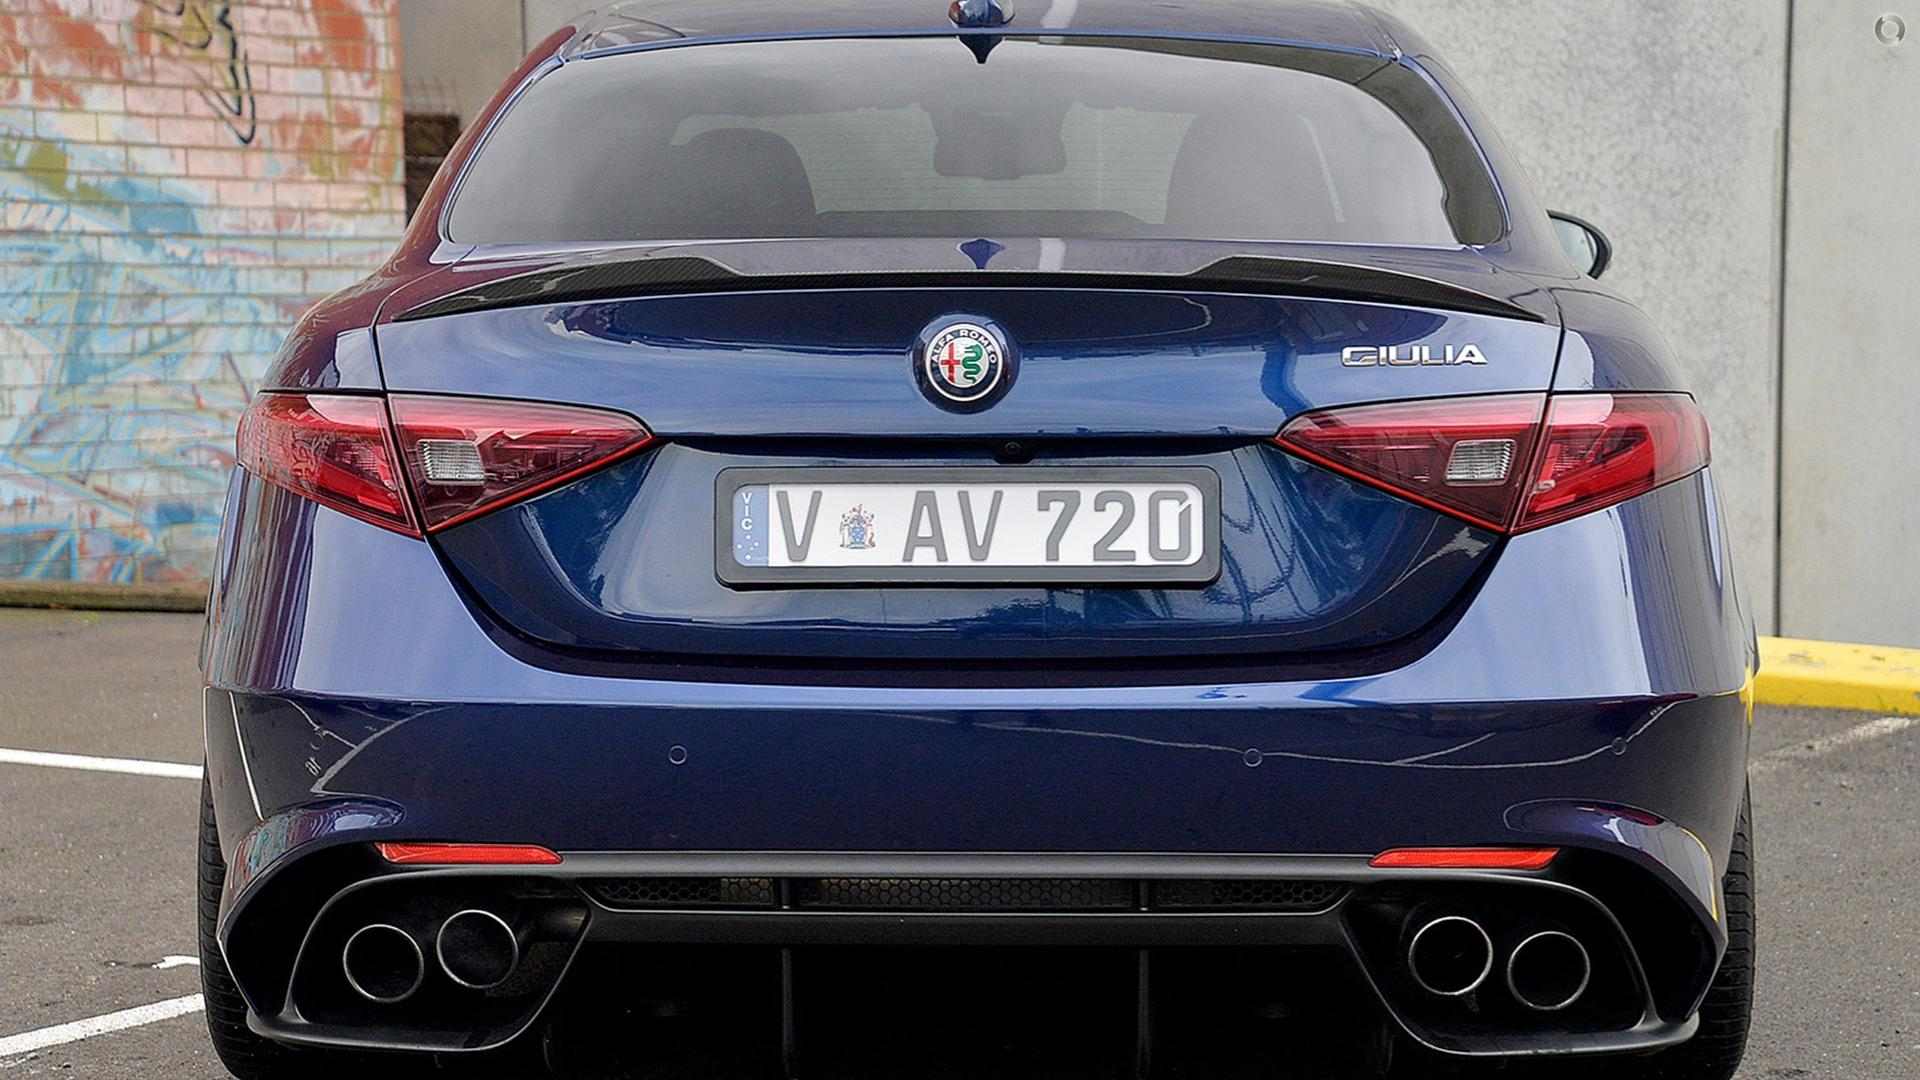 2017 Alfa Romeo Giulia Quadrifoglio (No Series)